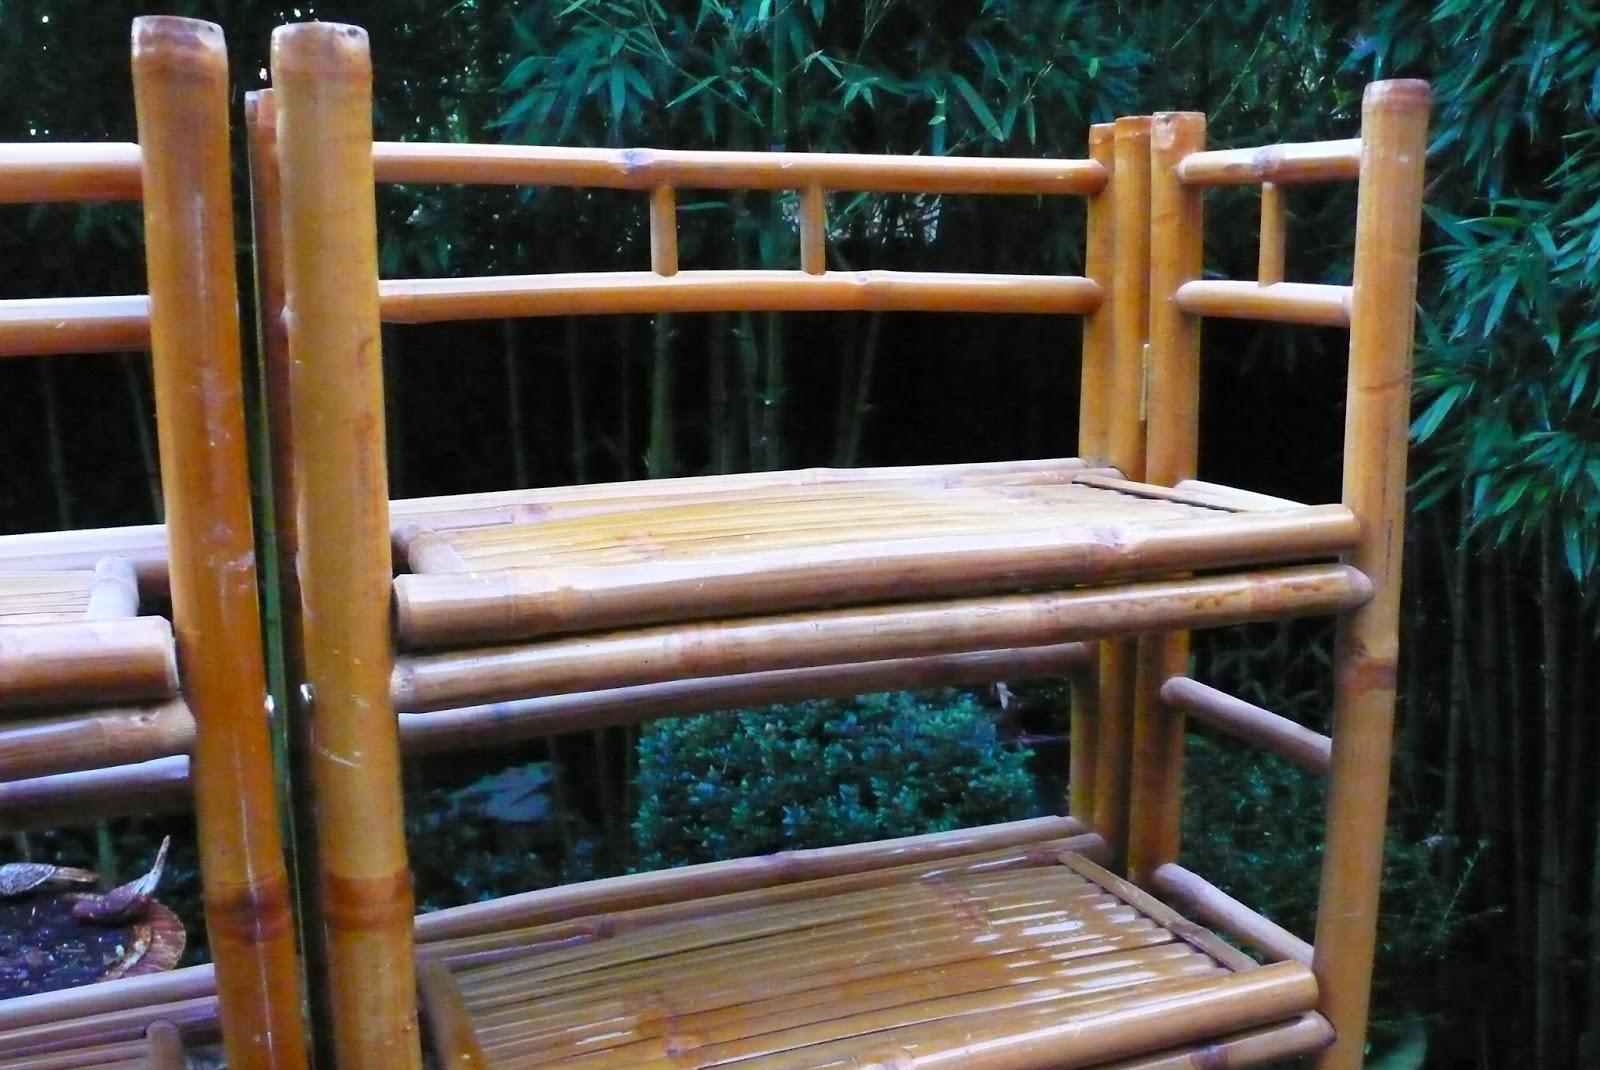 etag res en bambou bazar vintage bazar brocante. Black Bedroom Furniture Sets. Home Design Ideas